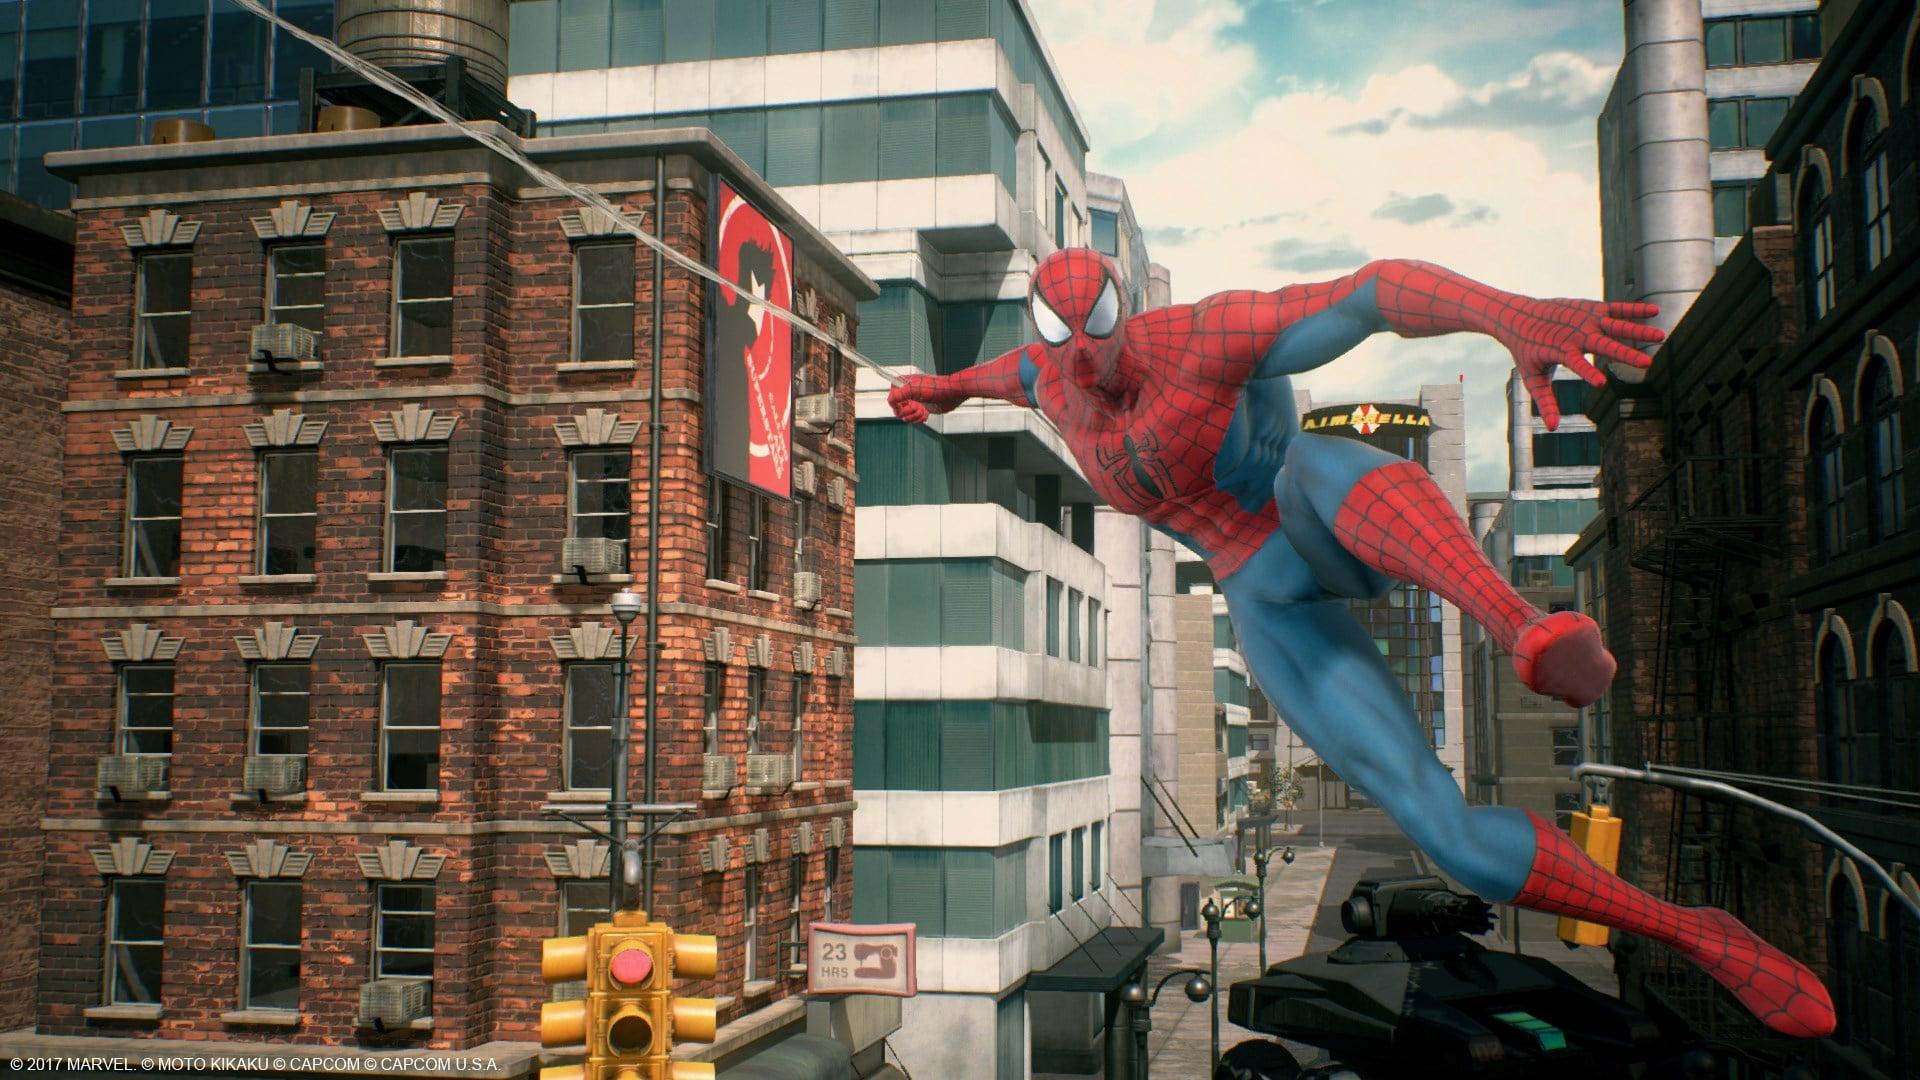 MVCI_1707_Spider-Man_002_png_jpgcopy